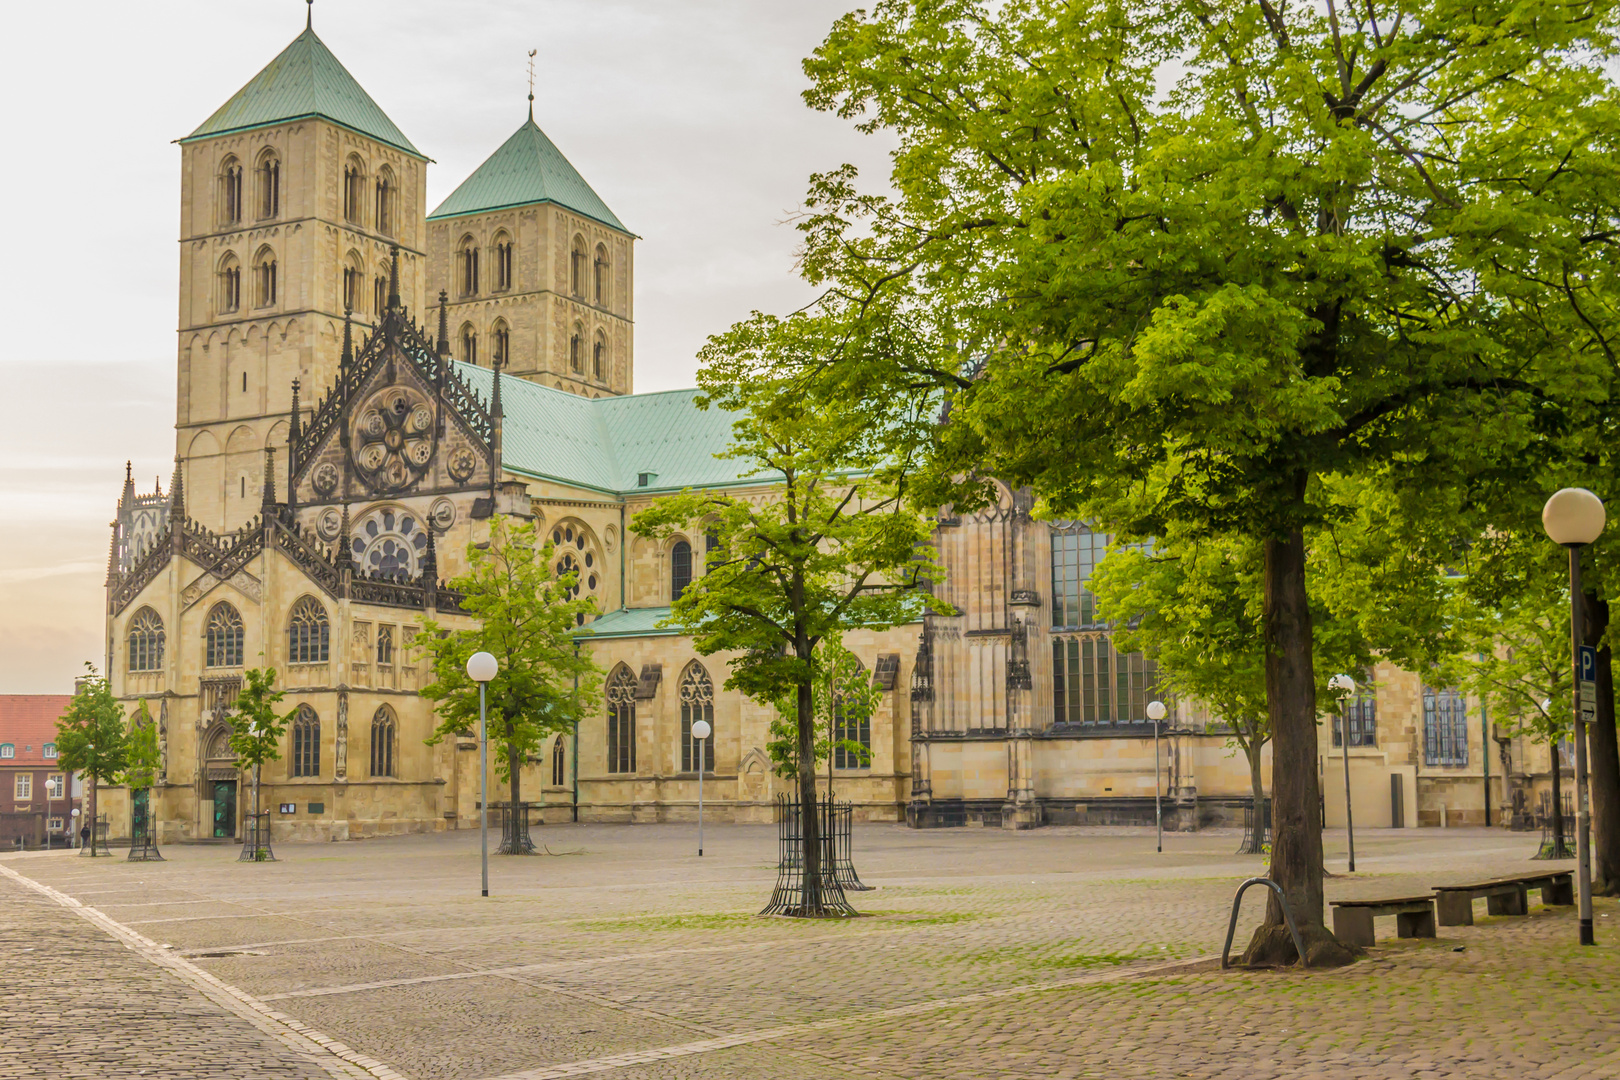 St.-Paulus- Dom zu Münster